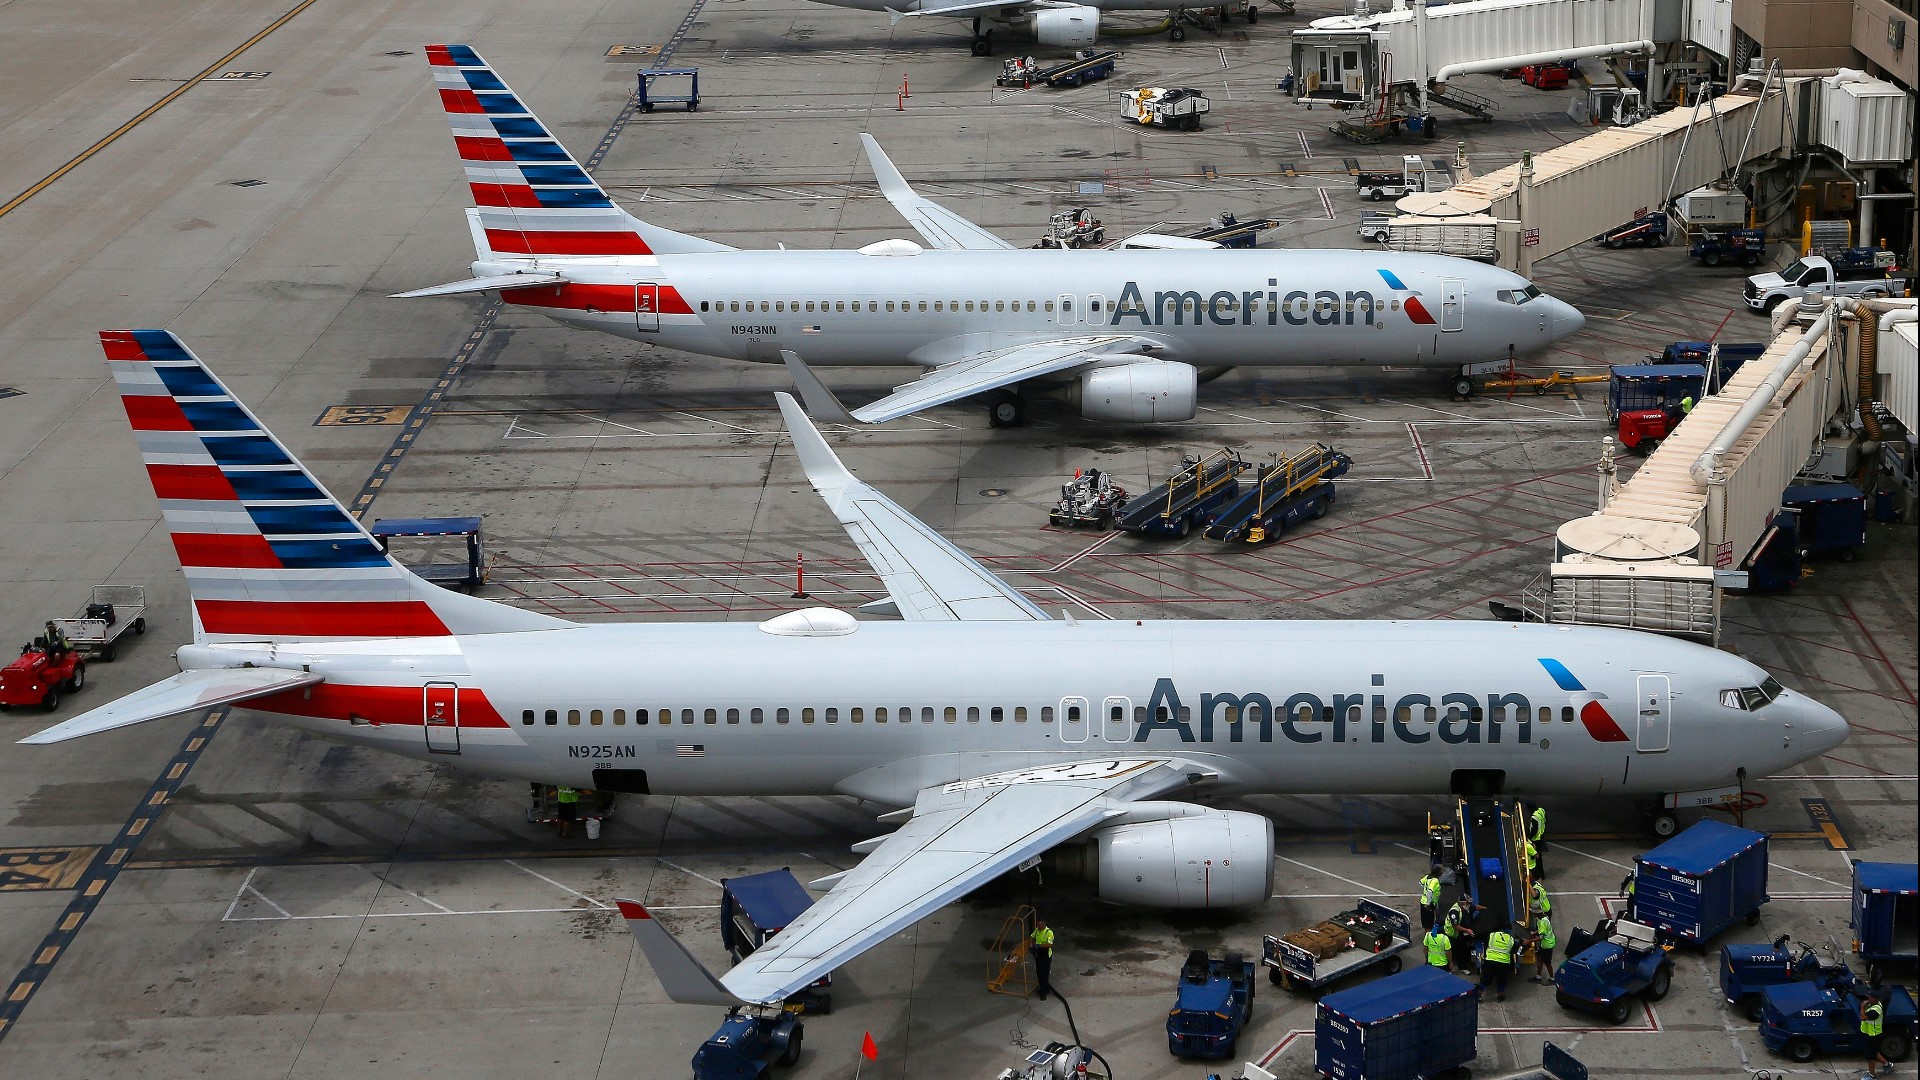 Американские авиакомпании American Airlines и United Airlines сократят более 32 тыс. сотрудников